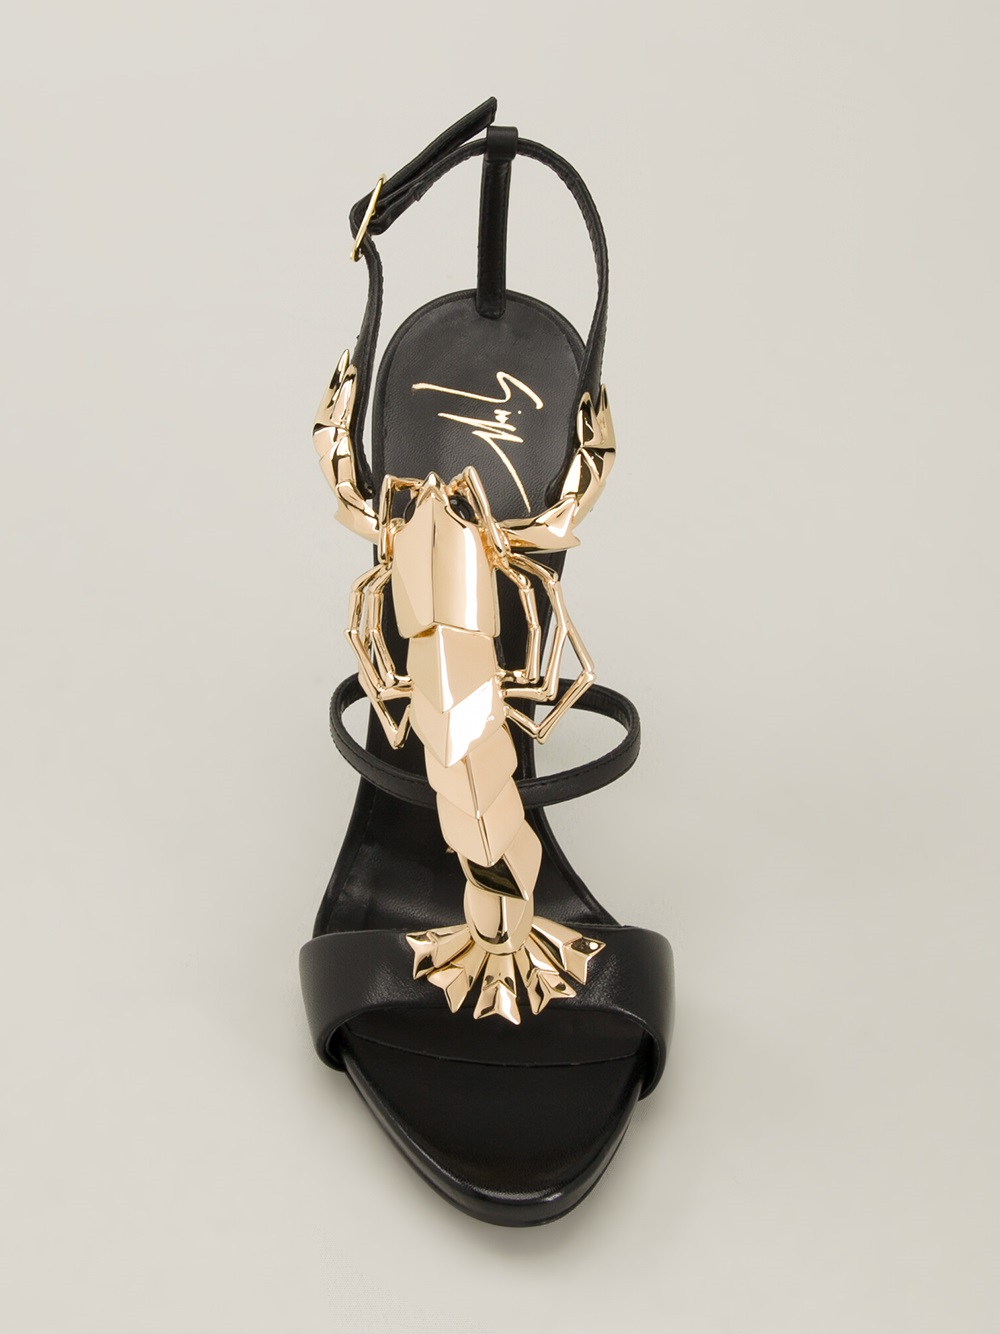 e334f7e46b5e1 Giuseppe Zanotti Lobster Jewel Sandals in Black - Lyst